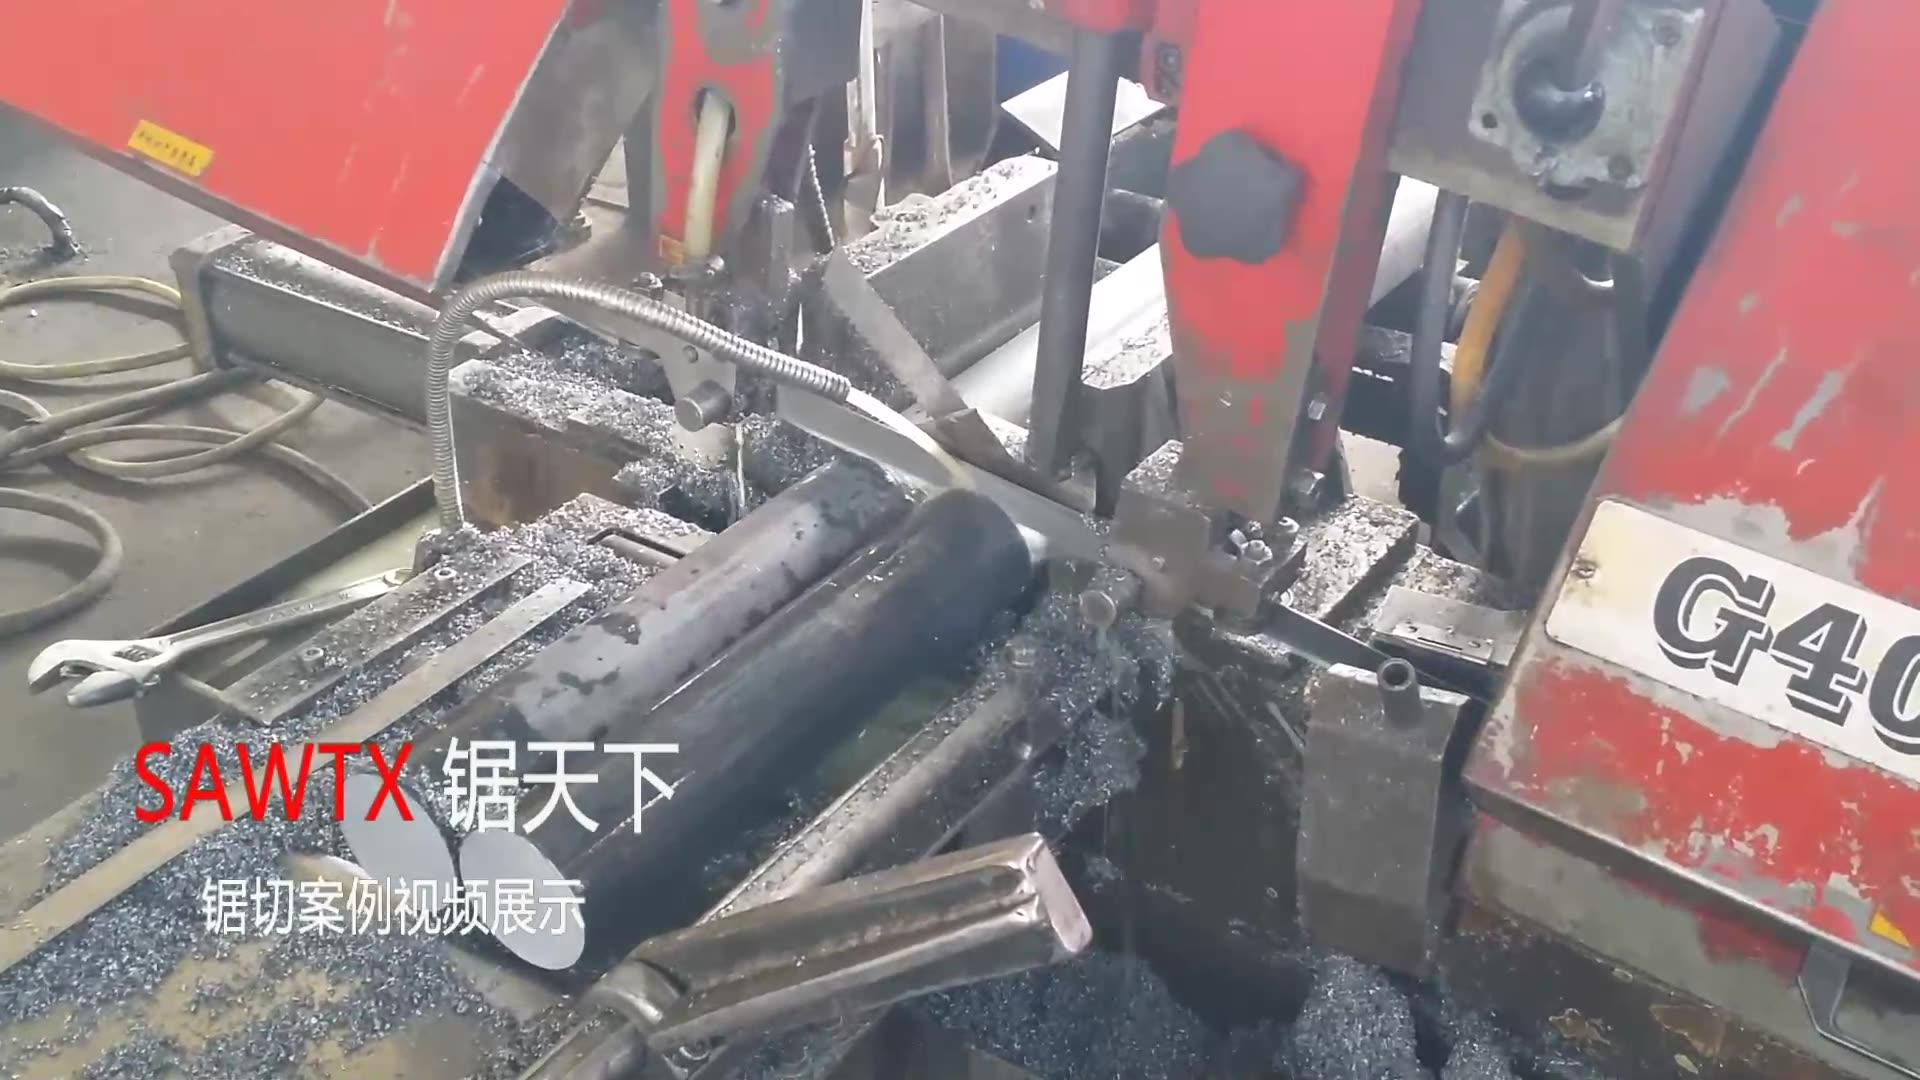 GWANG-SE锯切直径75,材质20洛锰钛